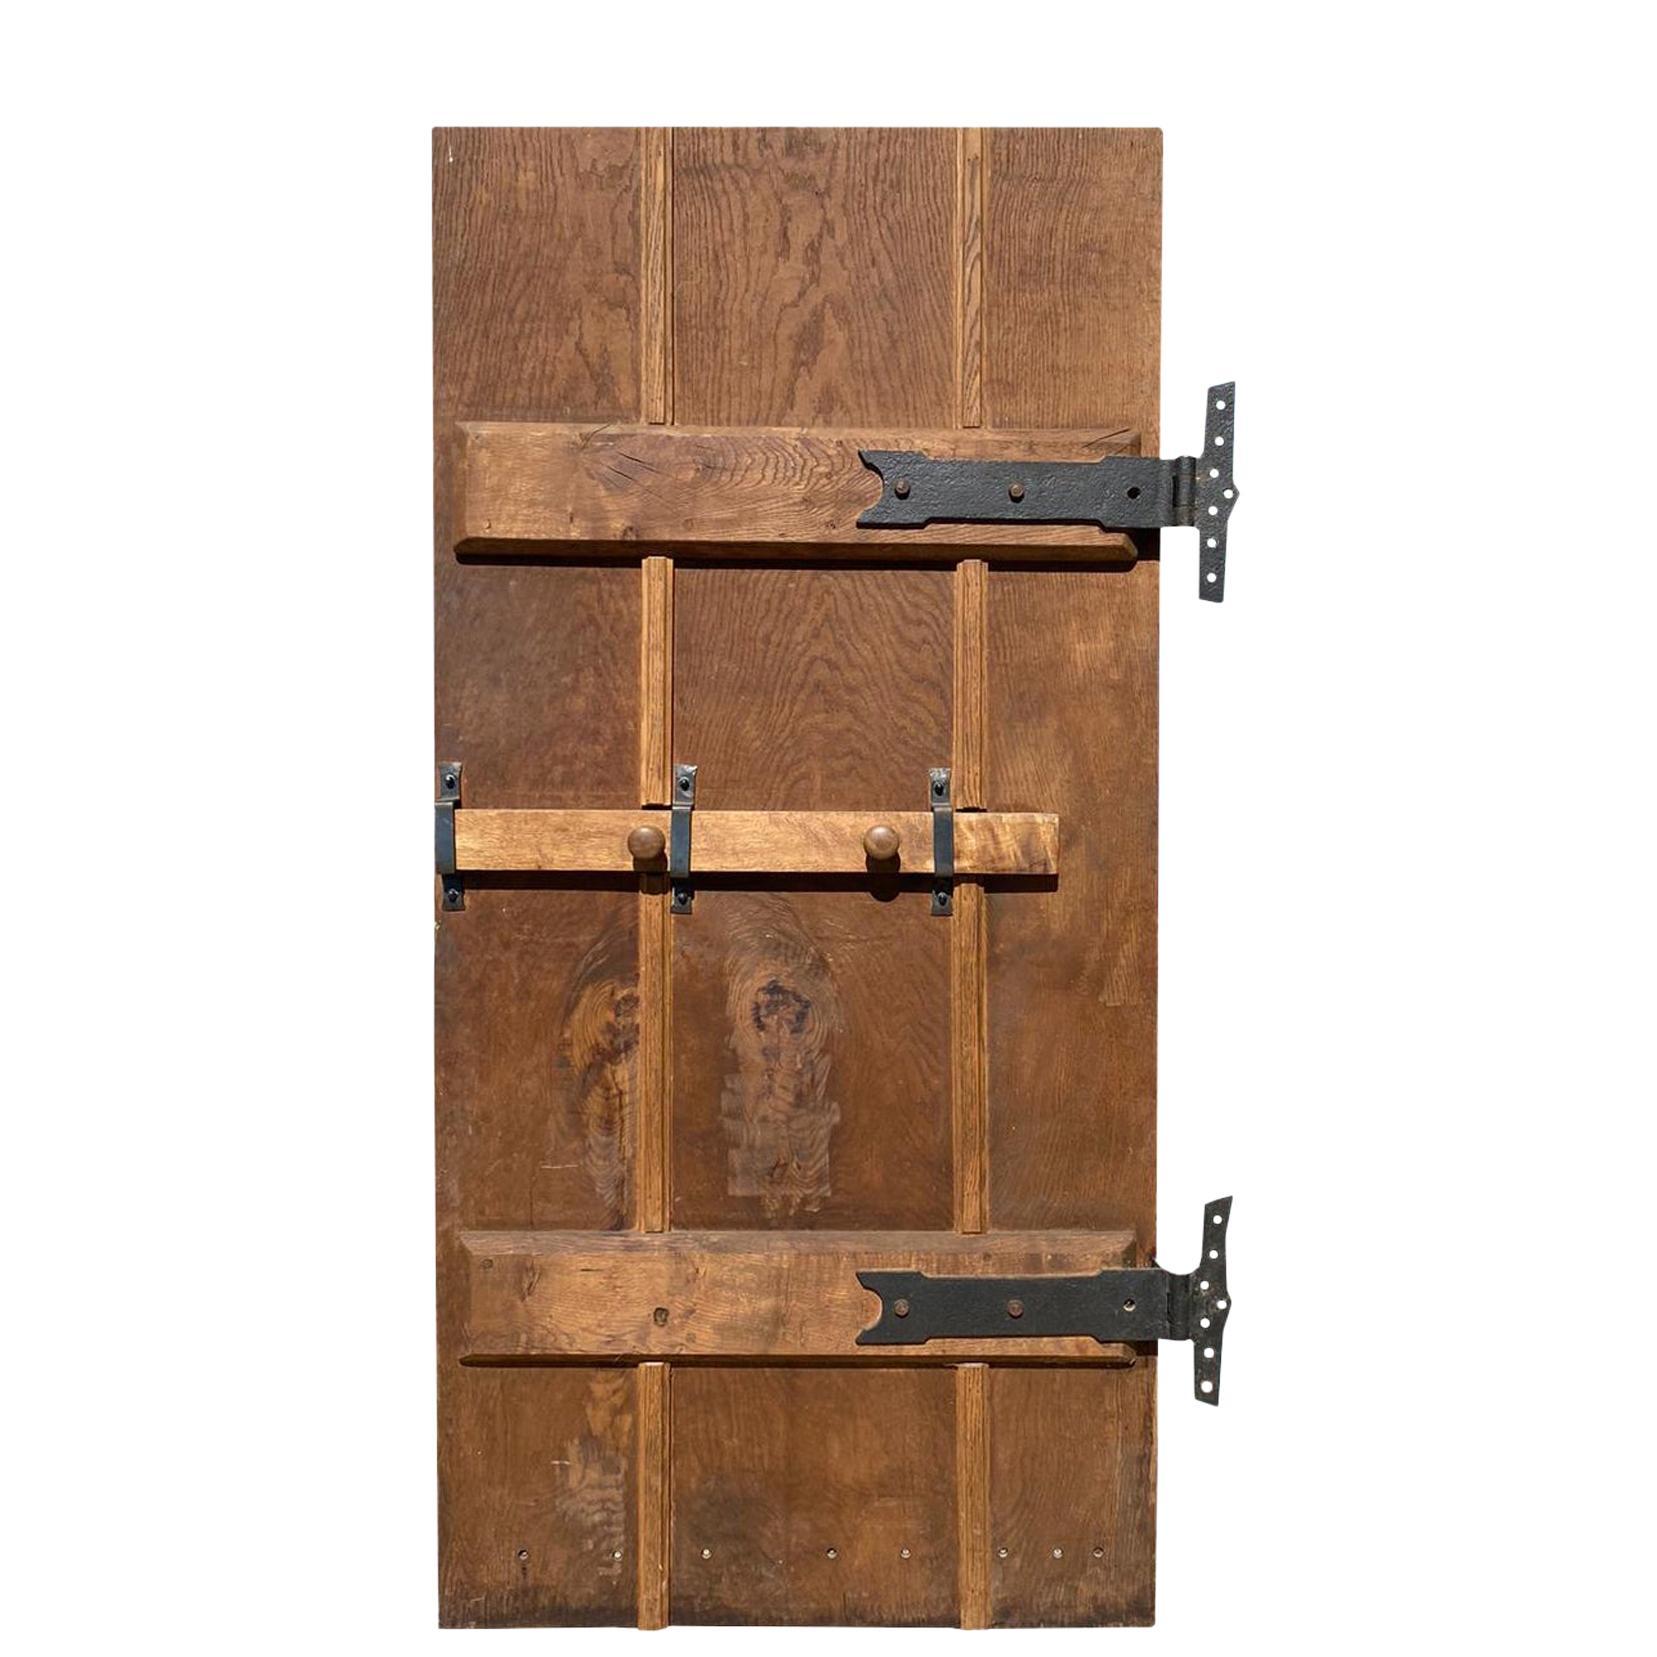 Reclaimed English Gothic Style Oak Exterior Door